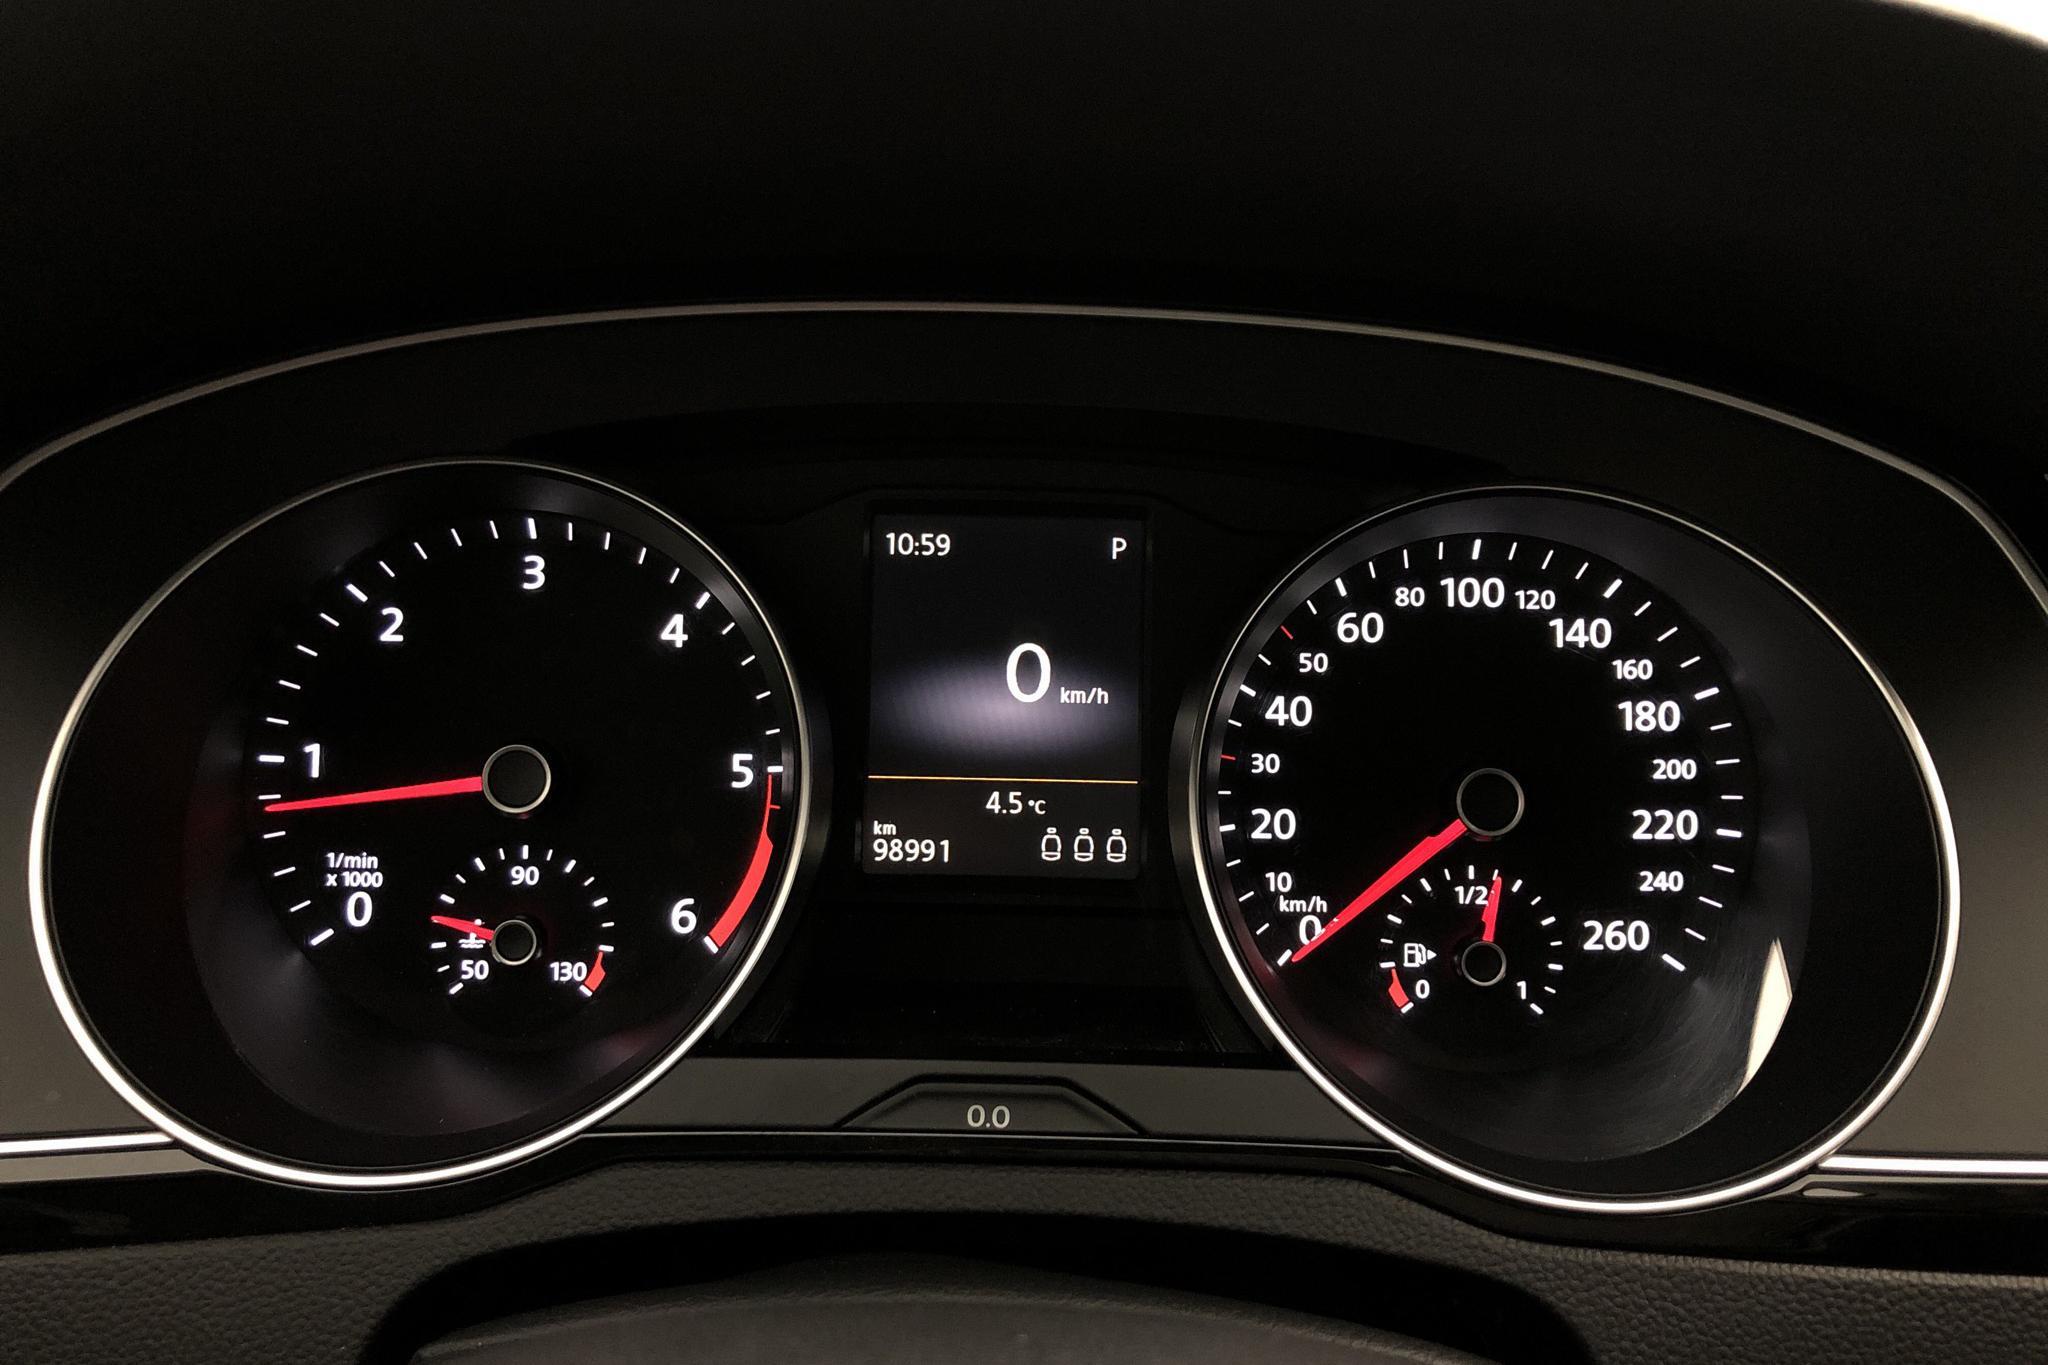 VW Passat Alltrack 2.0 TDI Sportscombi 4MOTION (190hk) - 9 899 mil - Automat - svart - 2016